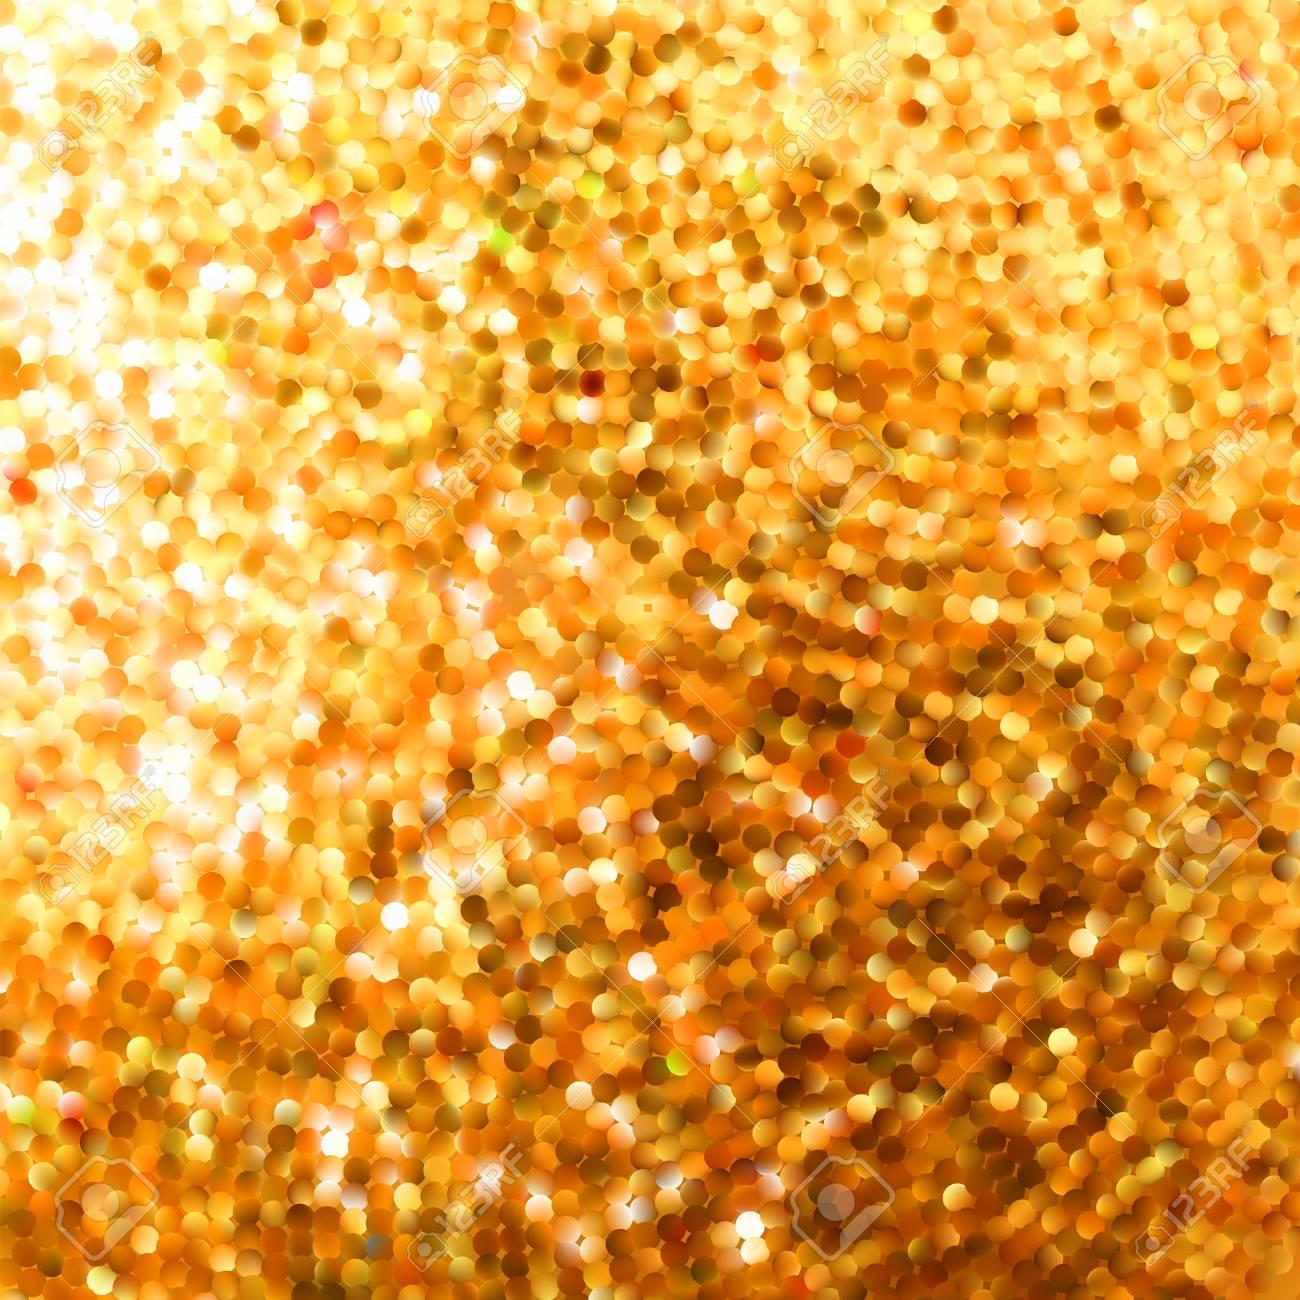 Amazing template design on orange glittering background Stock Vector - 17273043